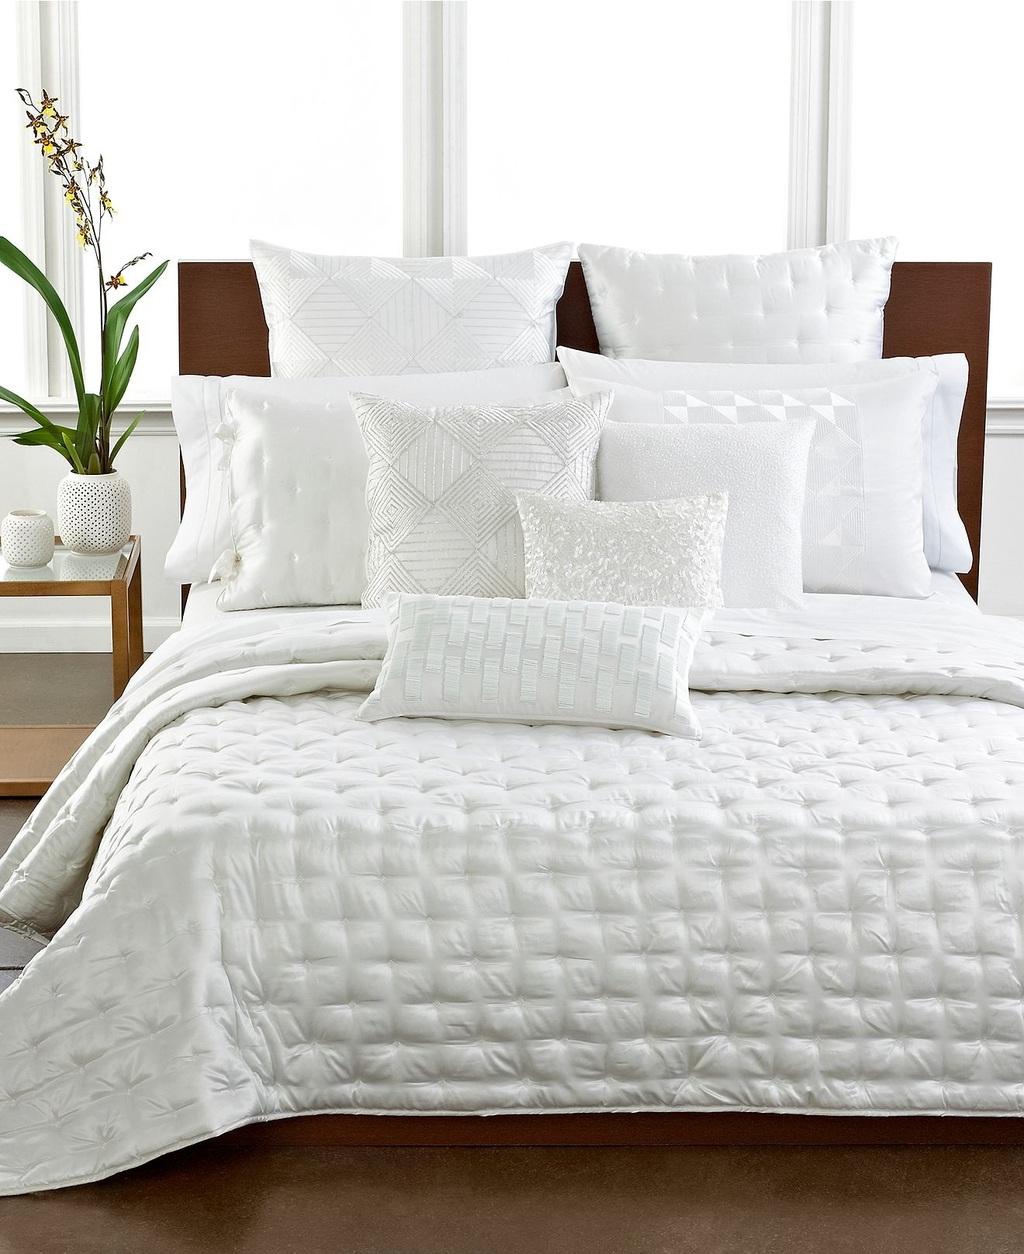 Hotel Collection Bedding Finest Silk Full Queen